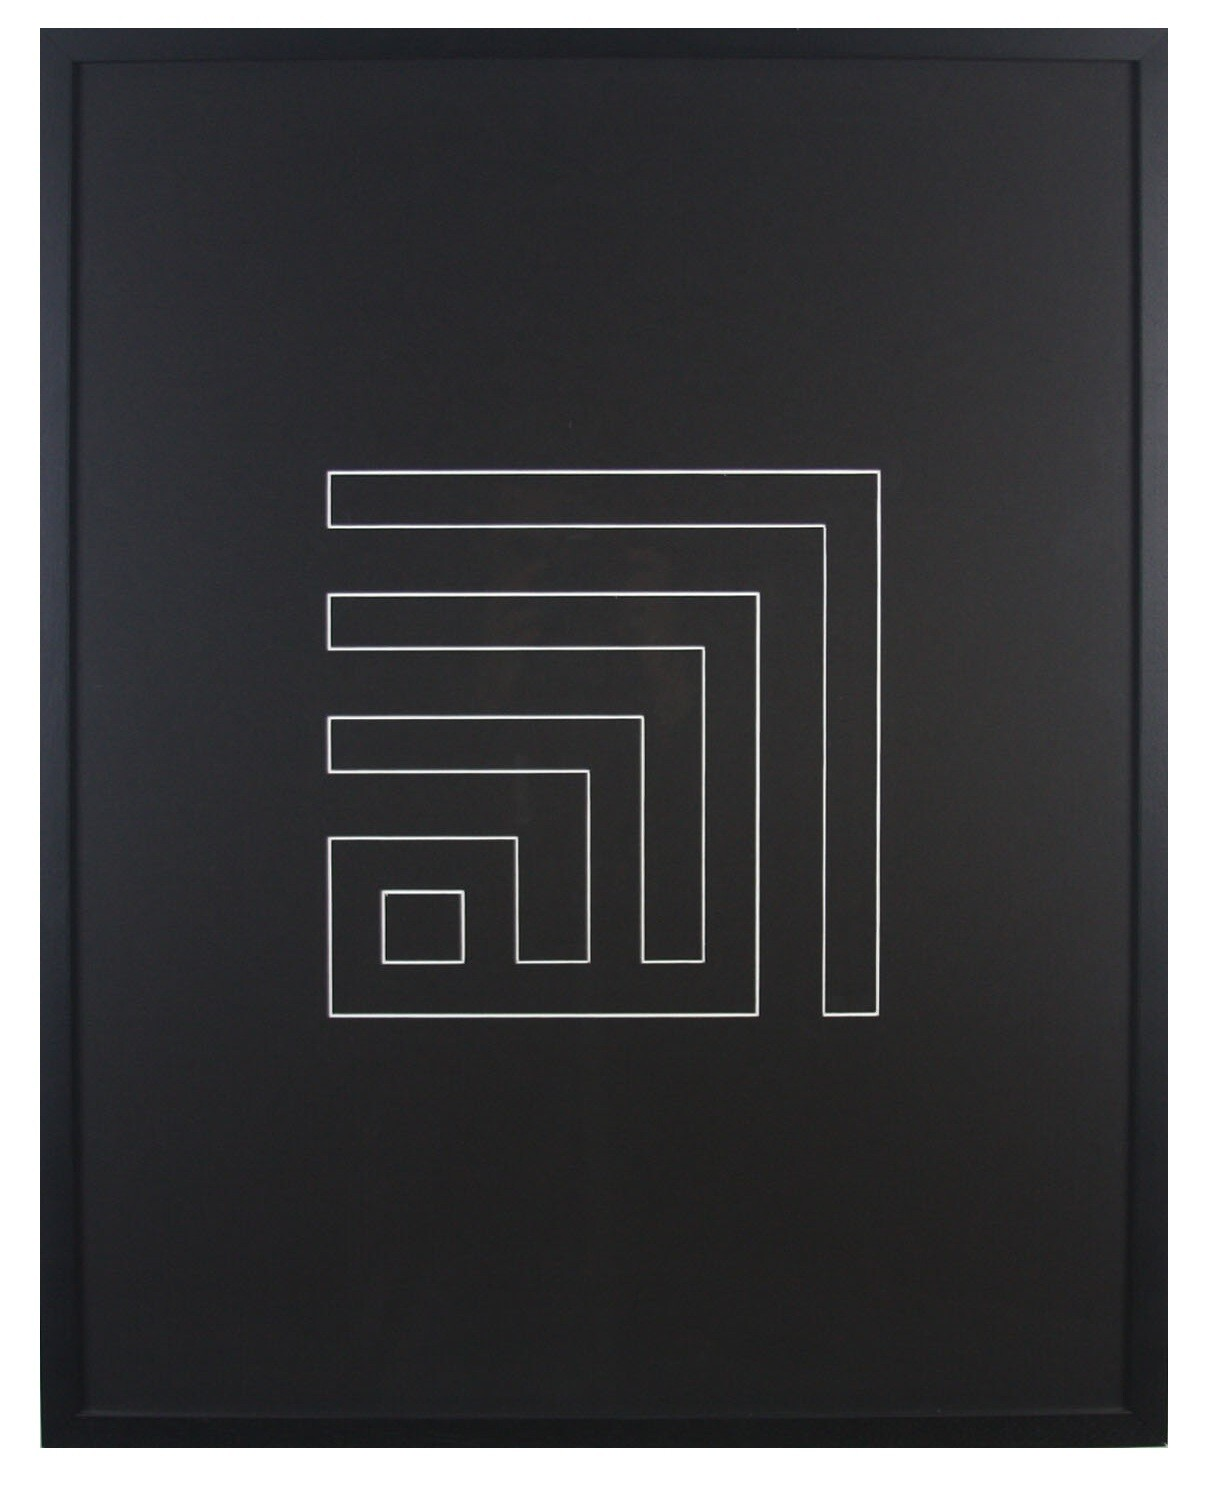 Allah Kufic Calligraphy V-Groove Design in Black 3D Matte Finish Box